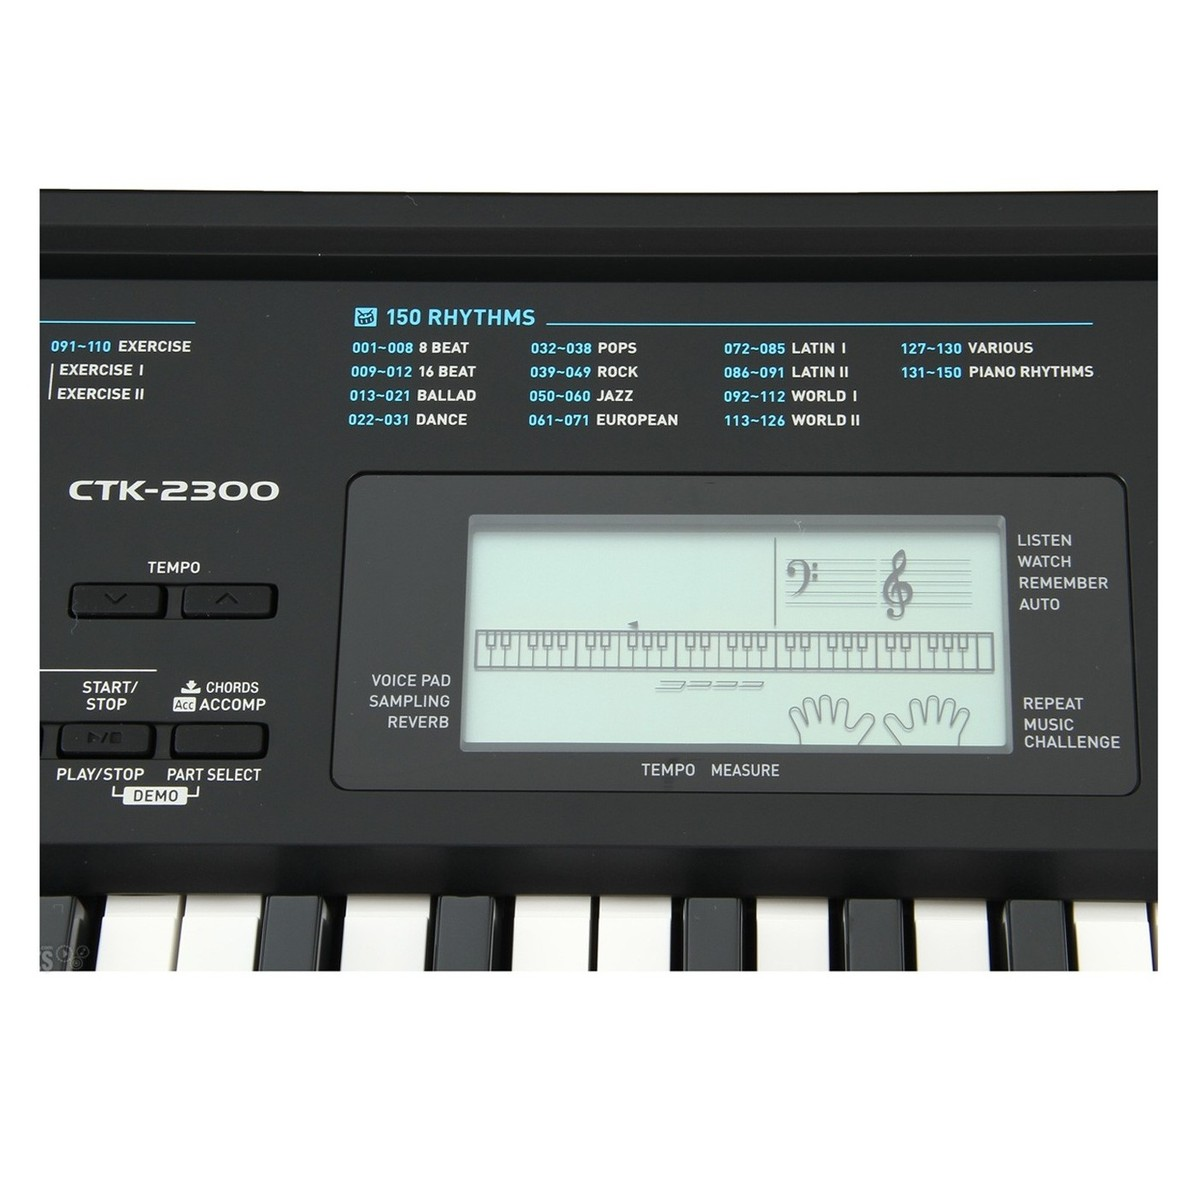 e7d7e36dcf8 Casio CTK-2300 Portable Keyboard, Black at Gear4music